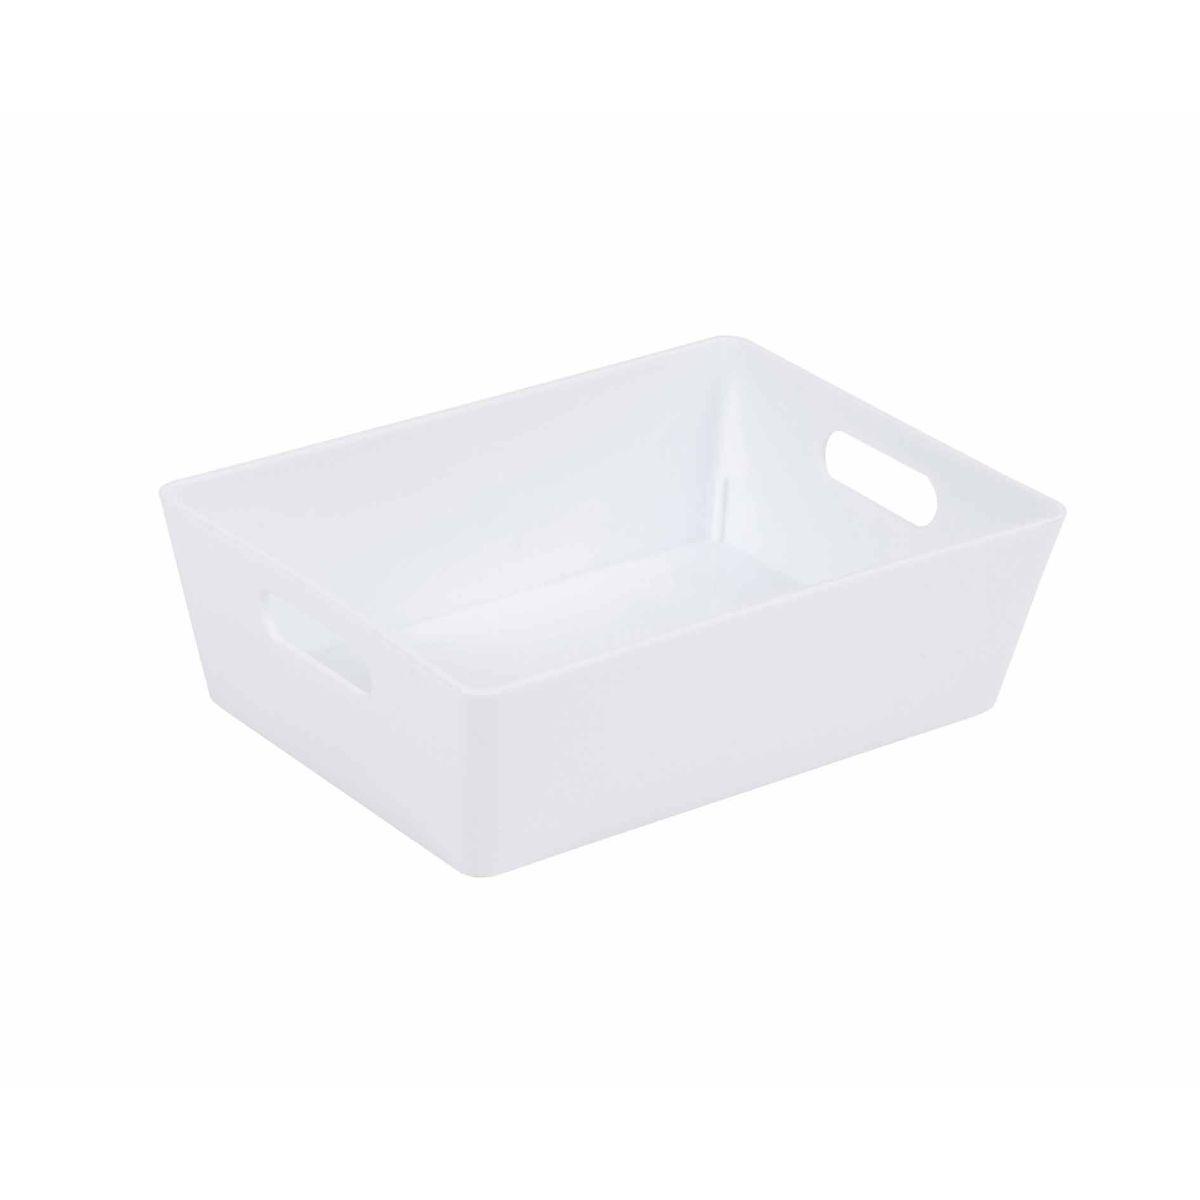 Wham Studio Rectangular Basket 3.01 Pack of 12 White